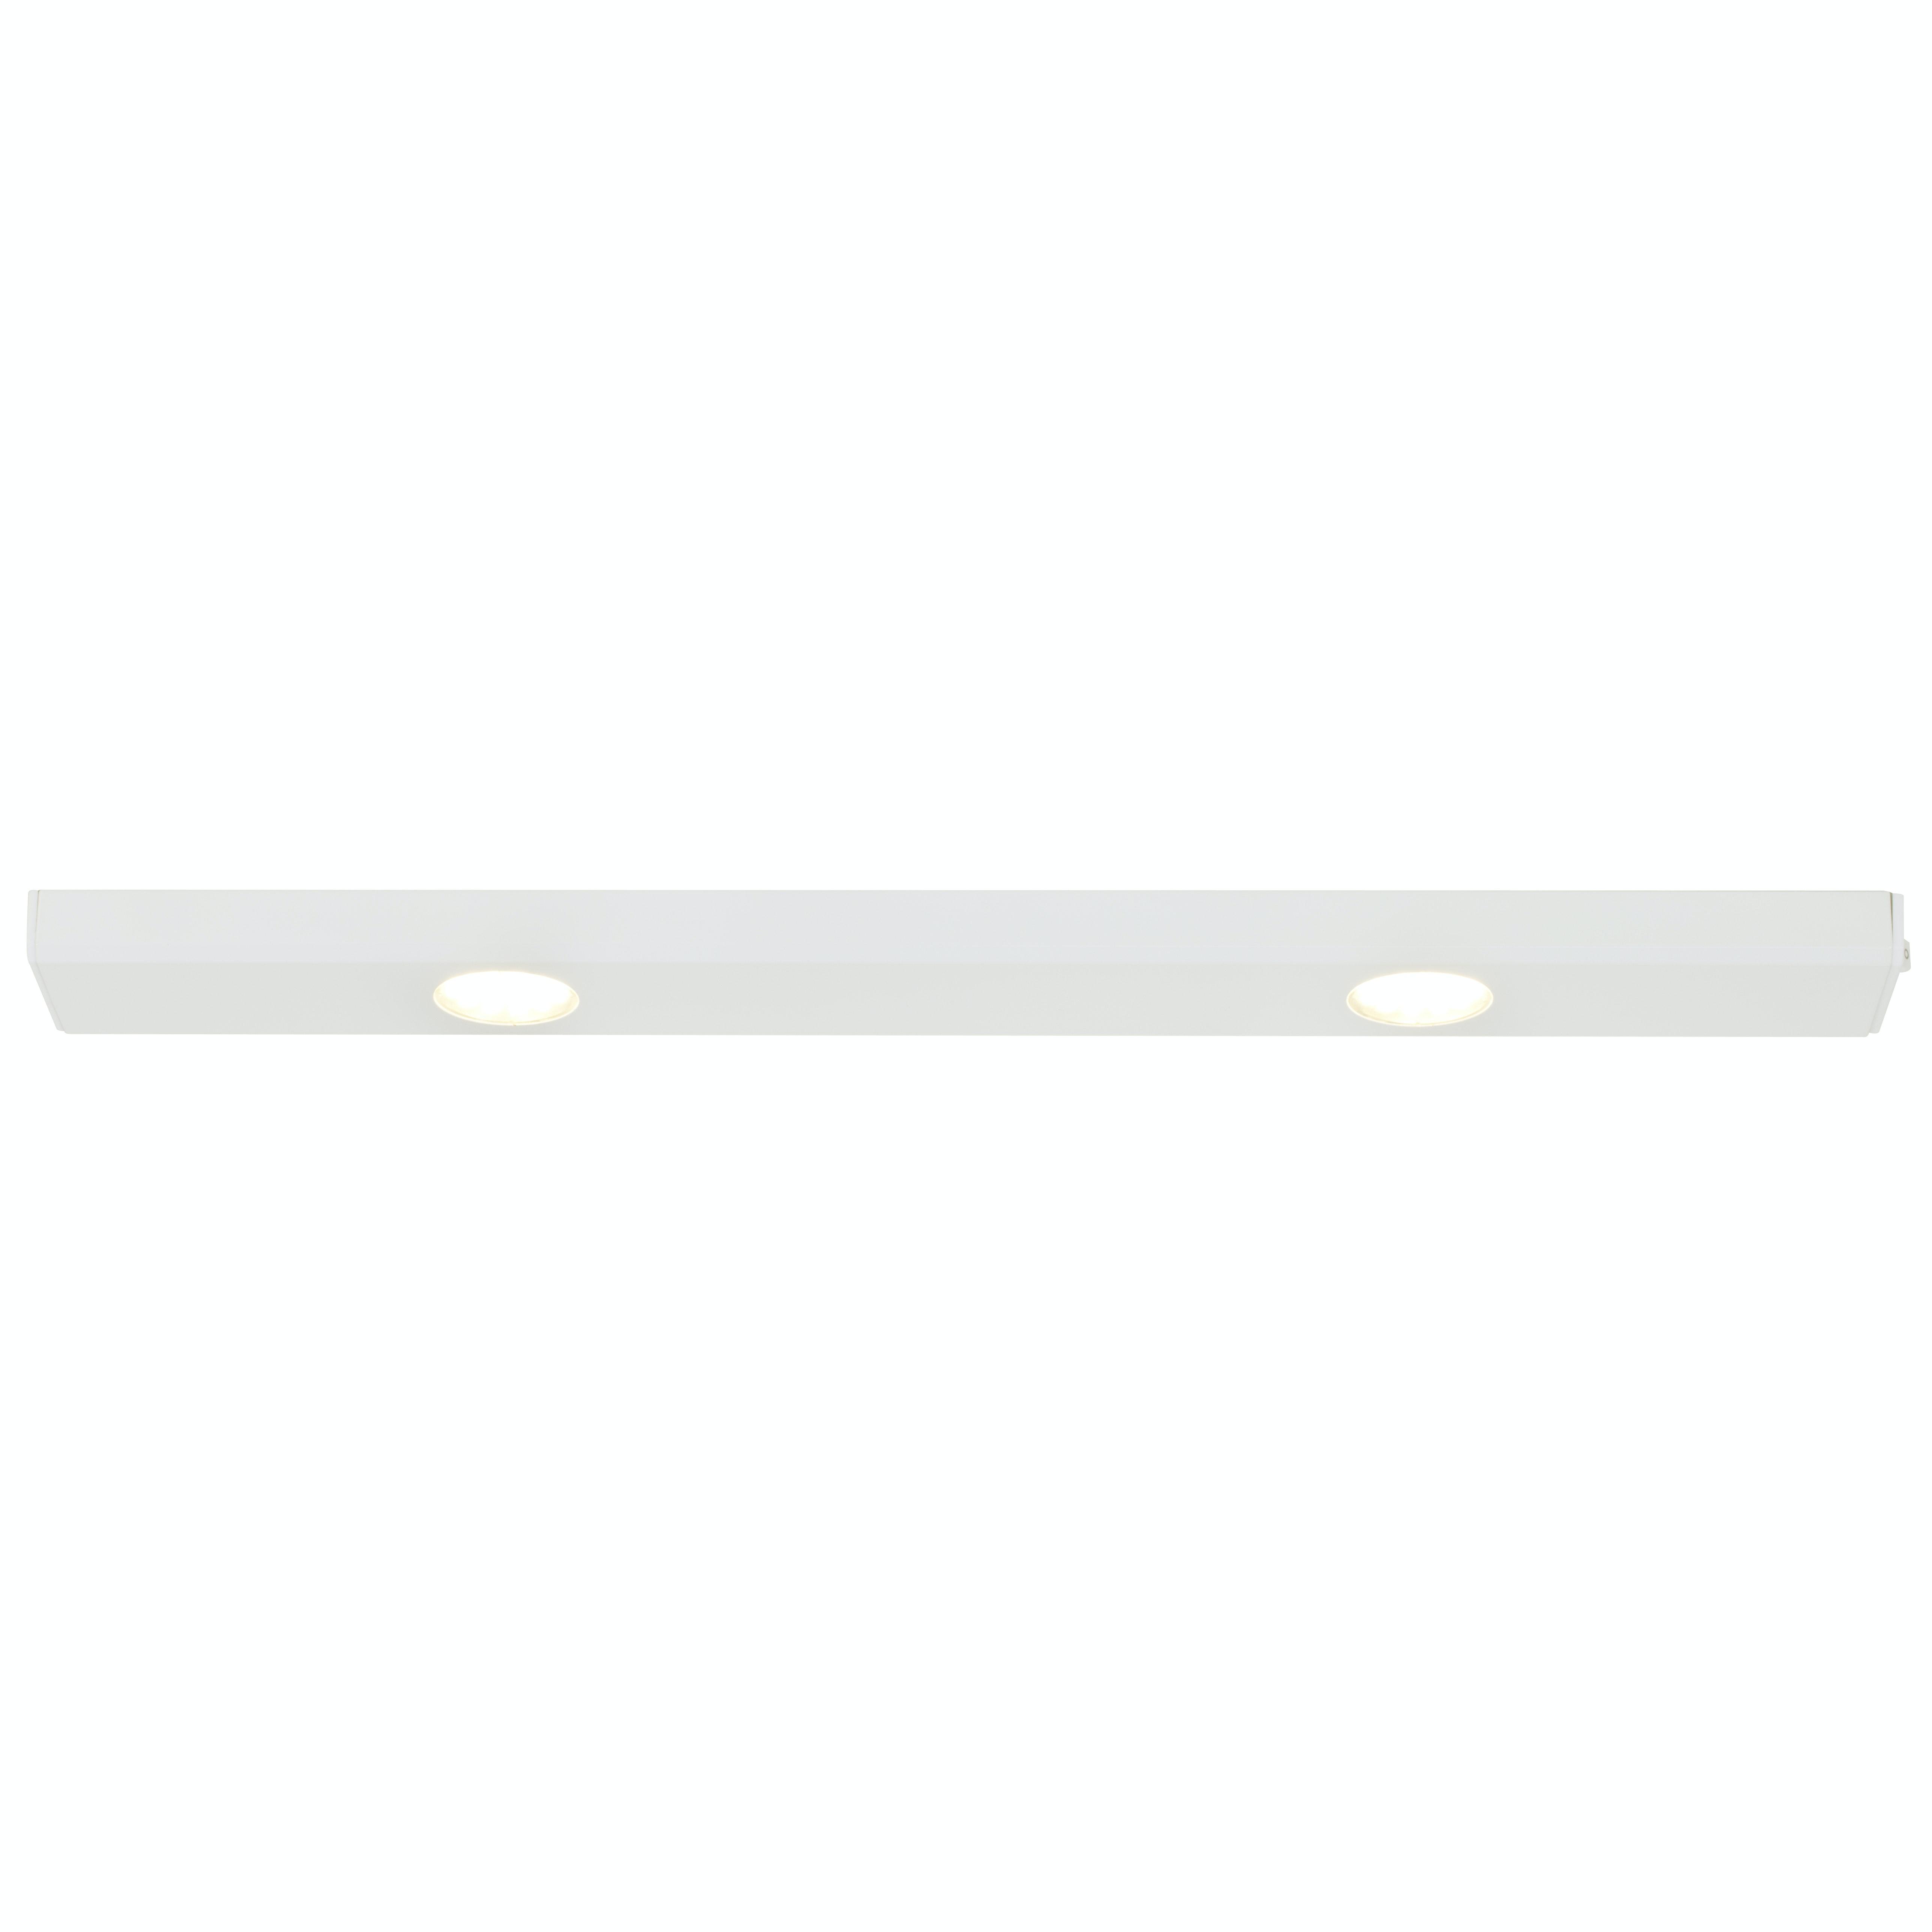 Bänkbelysning Nordlux Cabinet Led 2x3W Ej Dimbar Vit